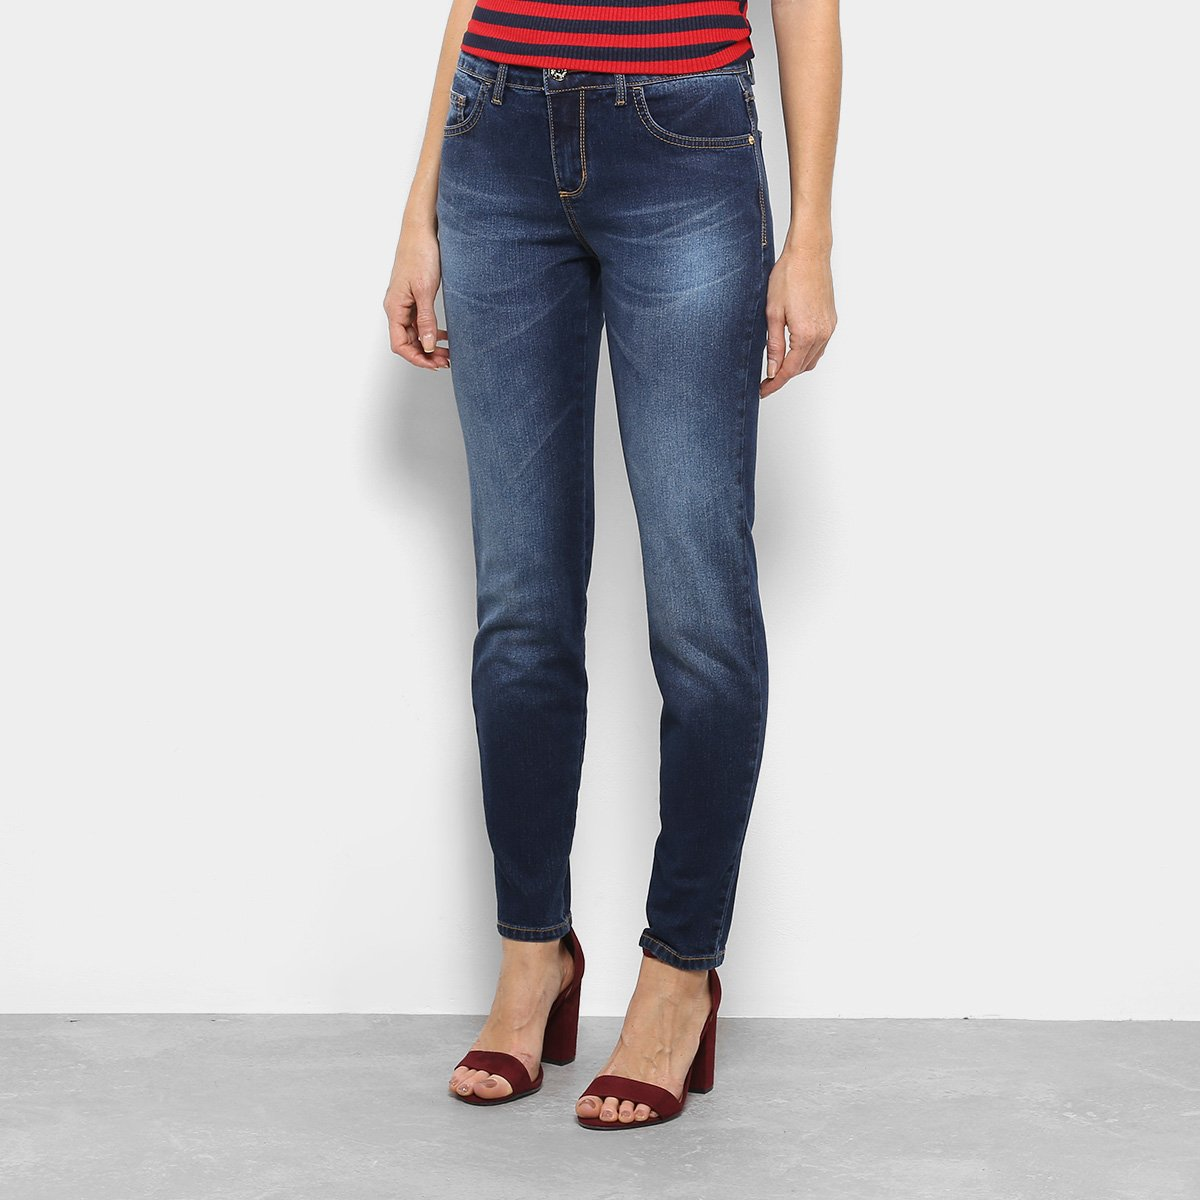 2662df086 Calça Jeans Skinny Triton Fátima Cintura Média Feminina - Azul - Compre  Agora | Zattini